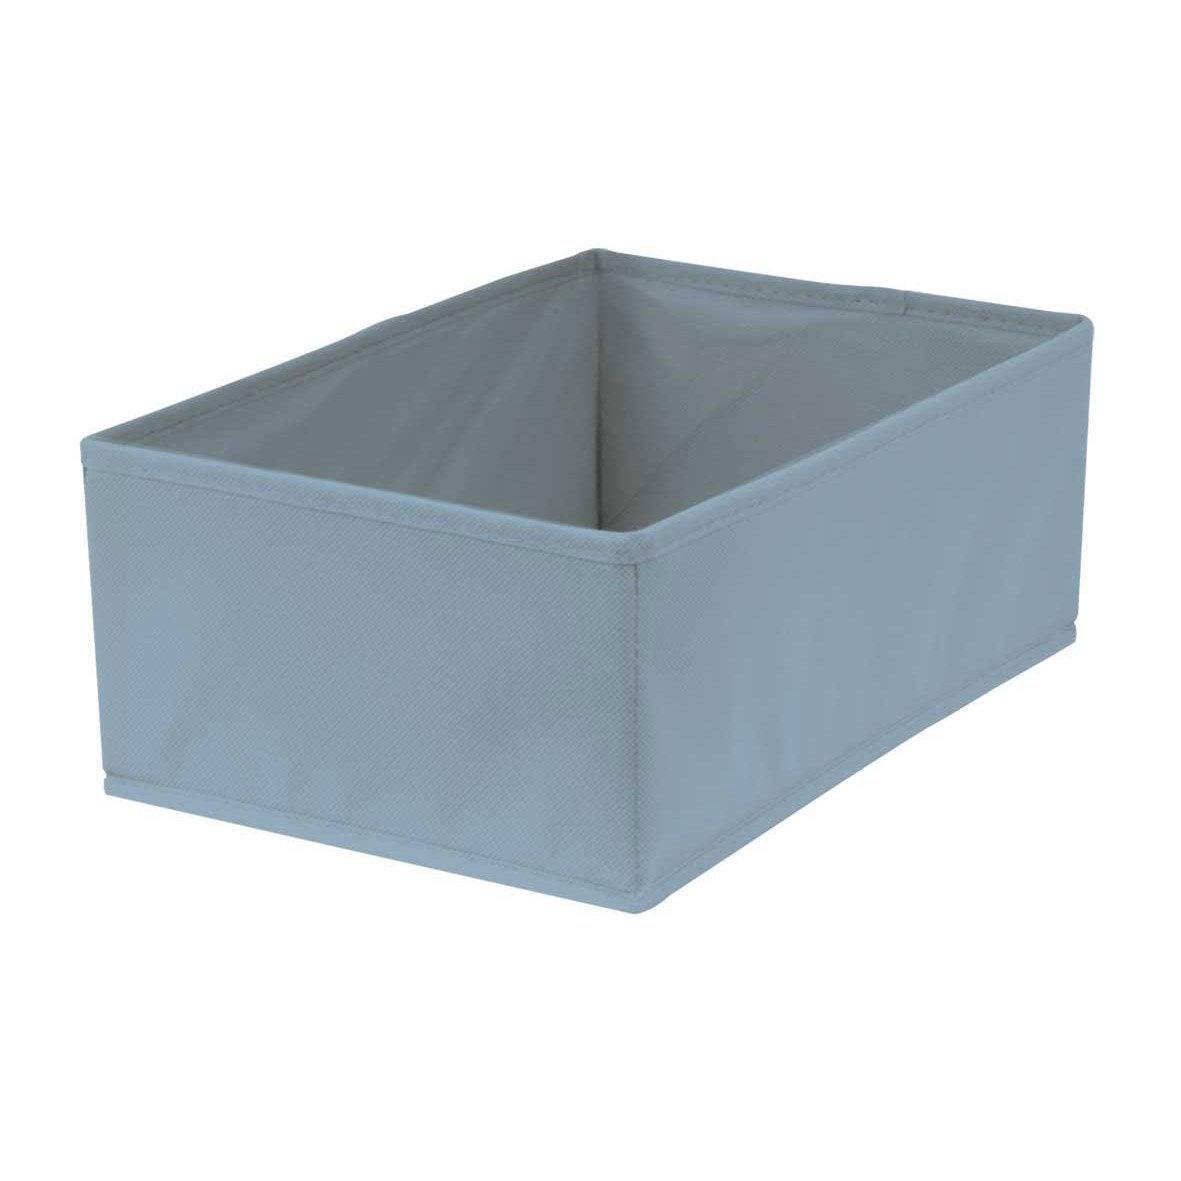 panier de rangement spaceo bleu x x cm leroy merlin. Black Bedroom Furniture Sets. Home Design Ideas